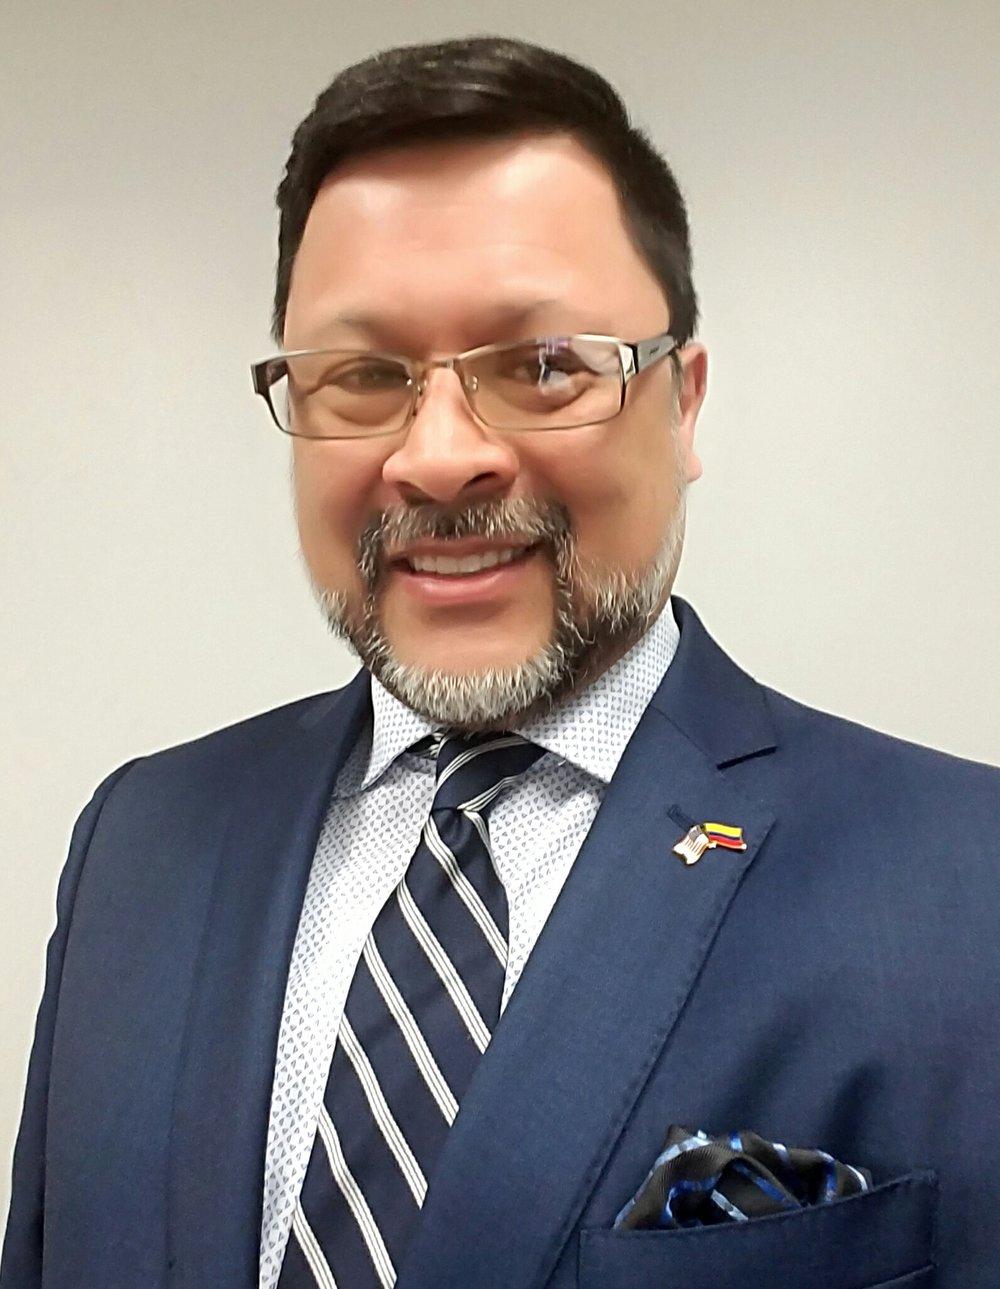 JOSE ARANGO, PRMG REVERE BRANCH MANAGER